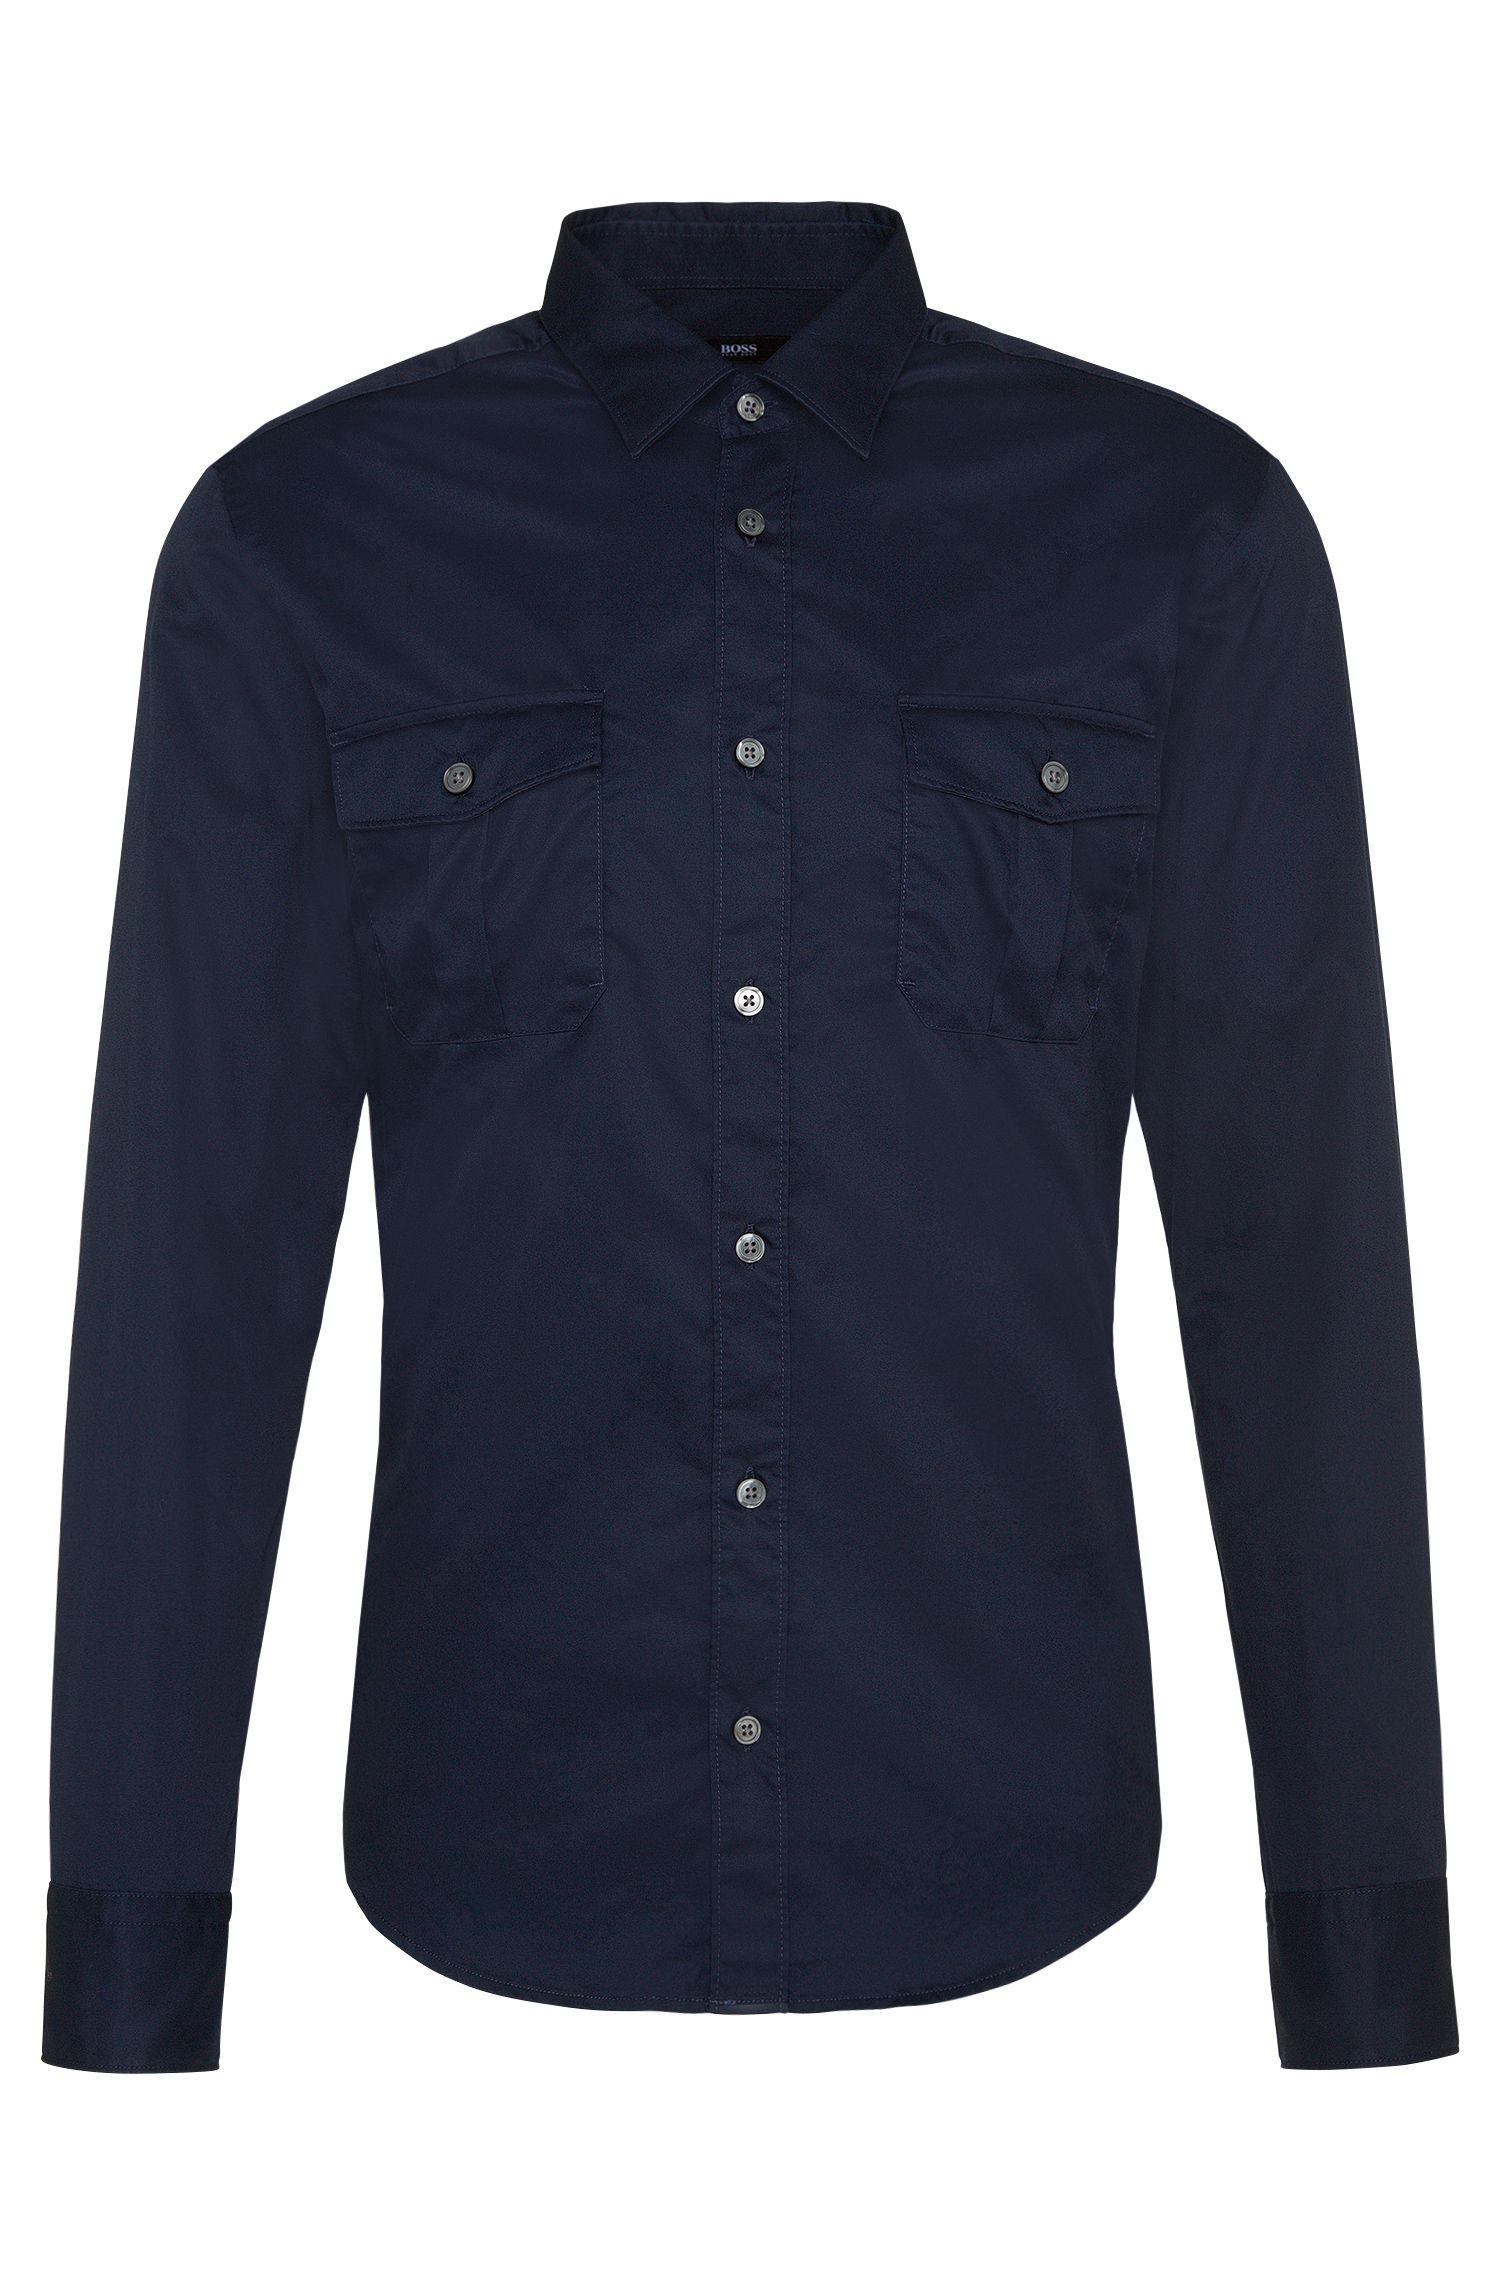 'Ramsey'   Slim Fit, Cotton Button Down Shirt